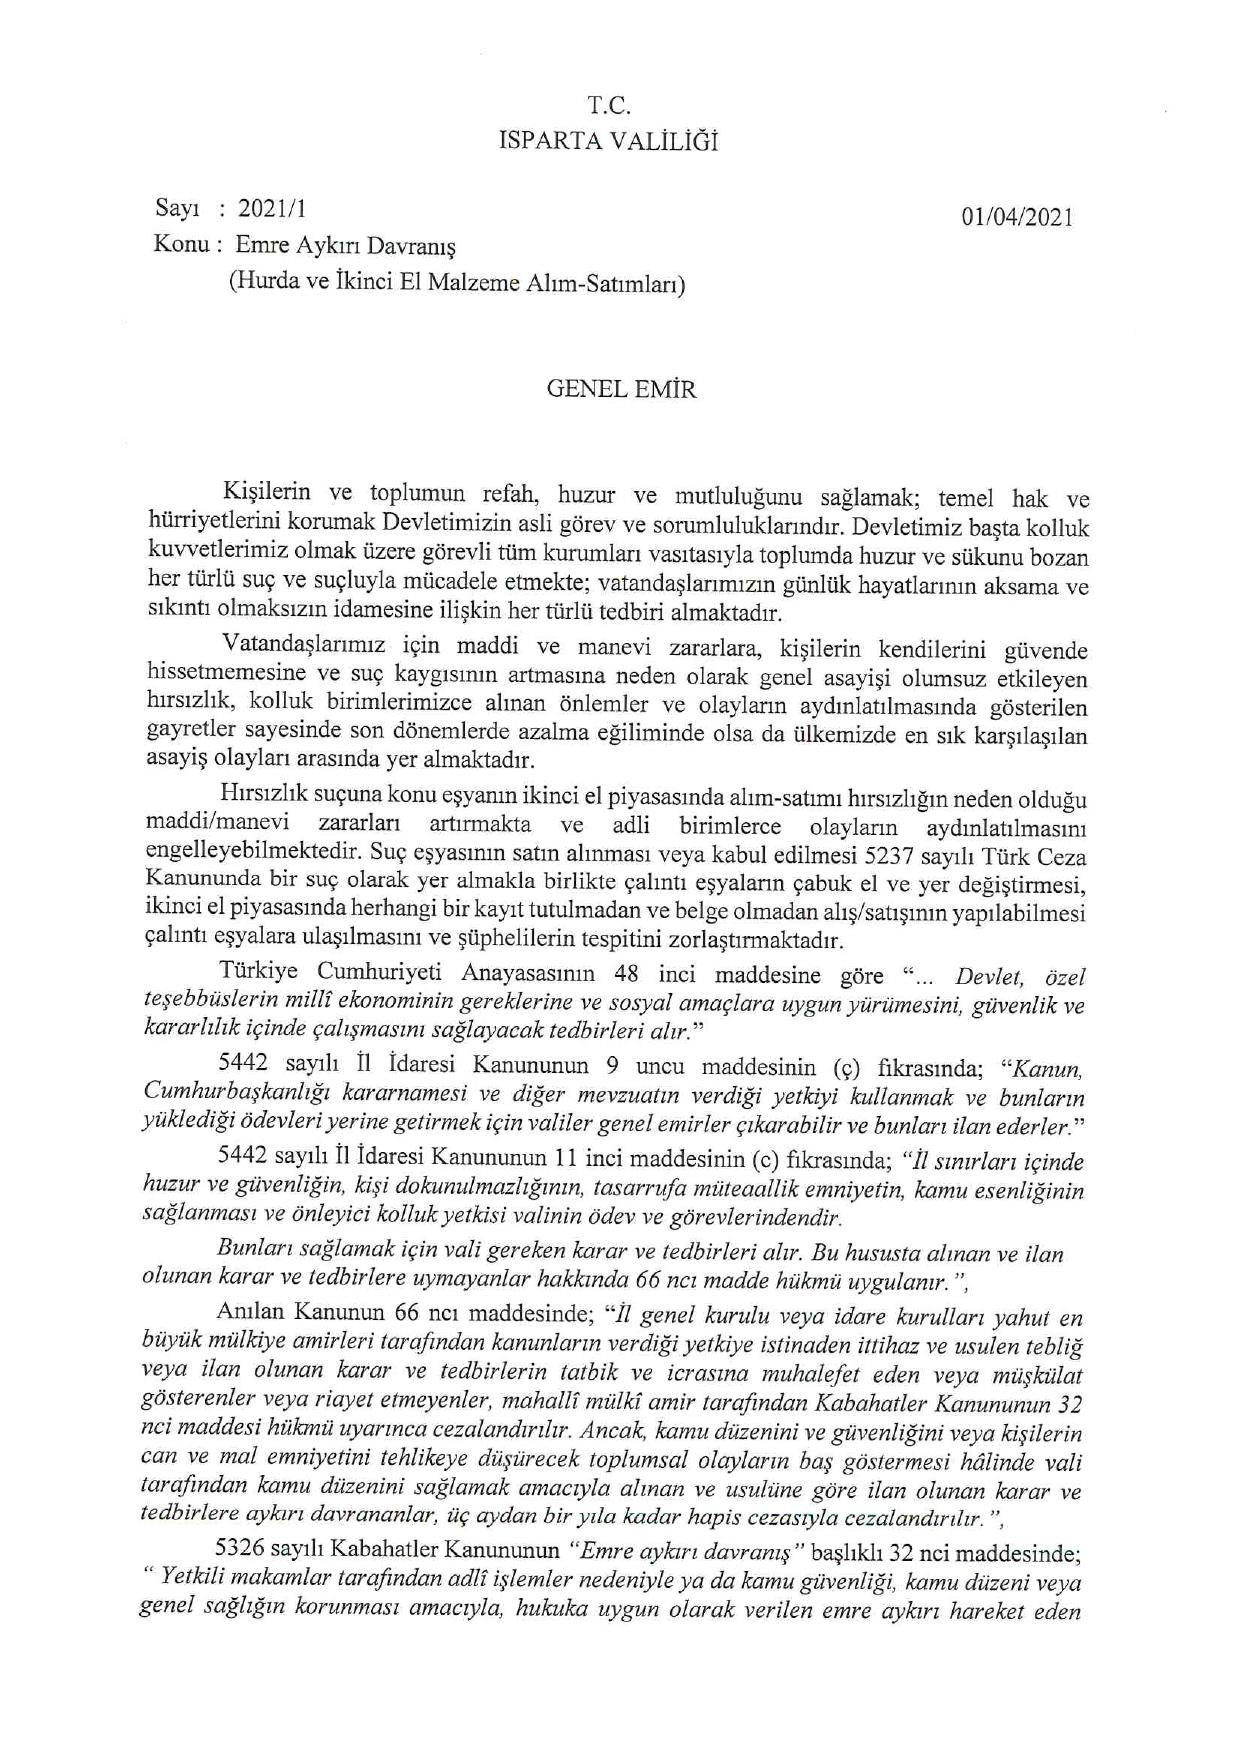 2021-1-Say-l-Valilik-Karar-Tebli-ler-page-0001